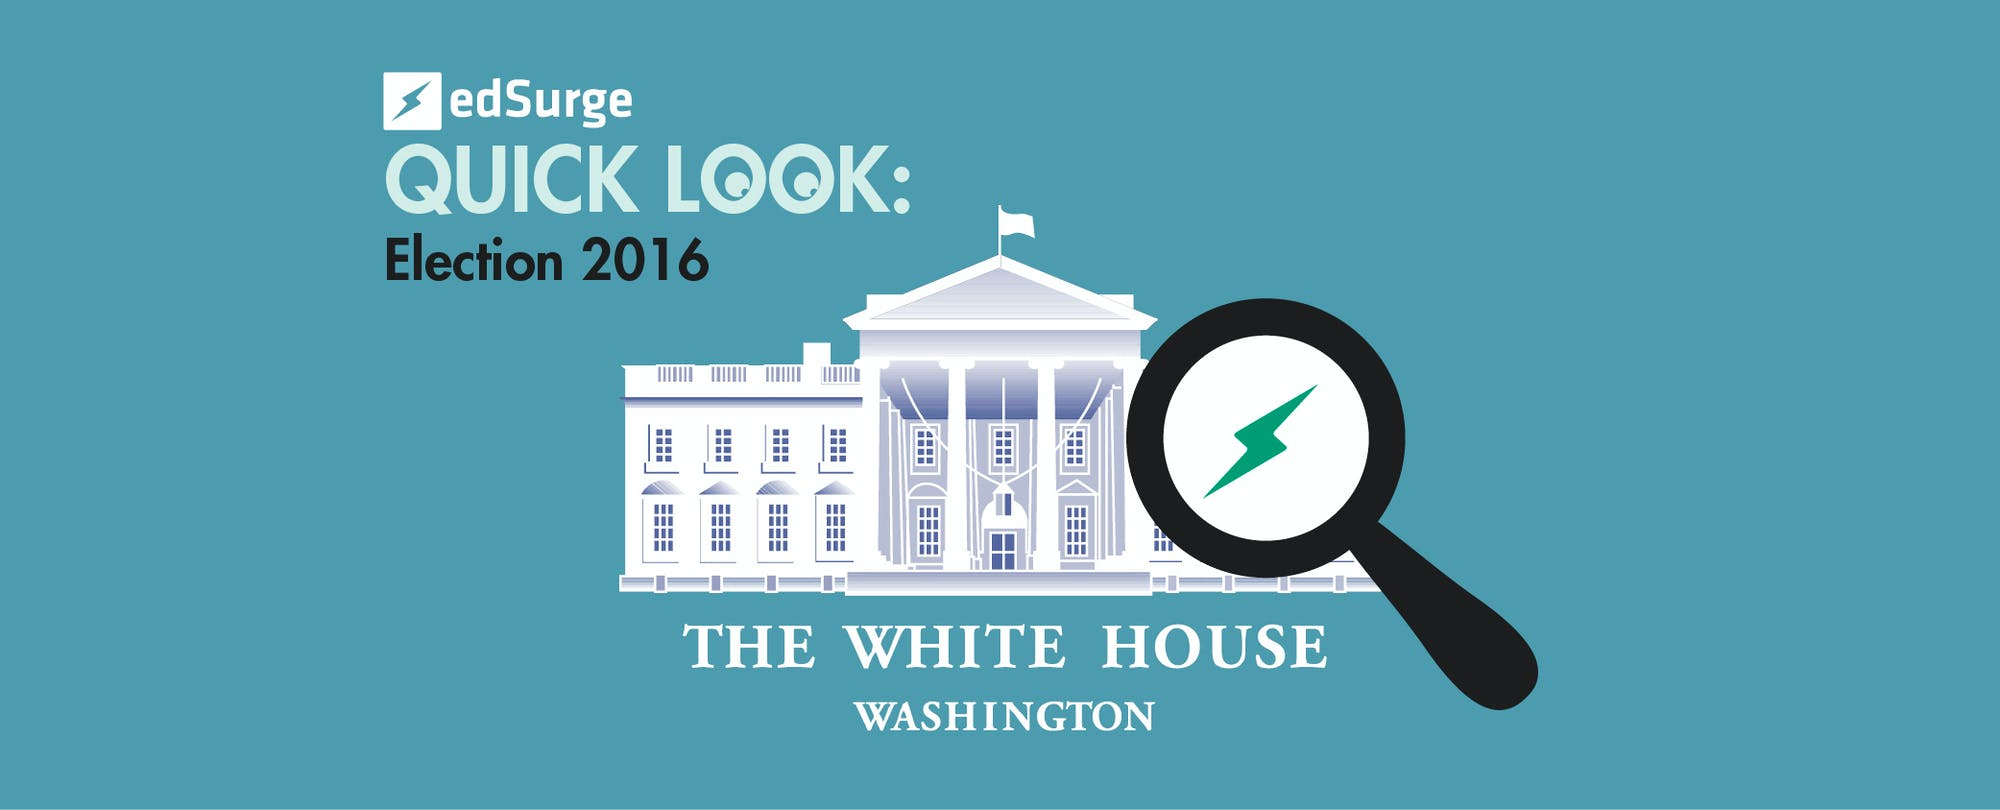 EdSurge Politics: 2016 Presidential Election Resources